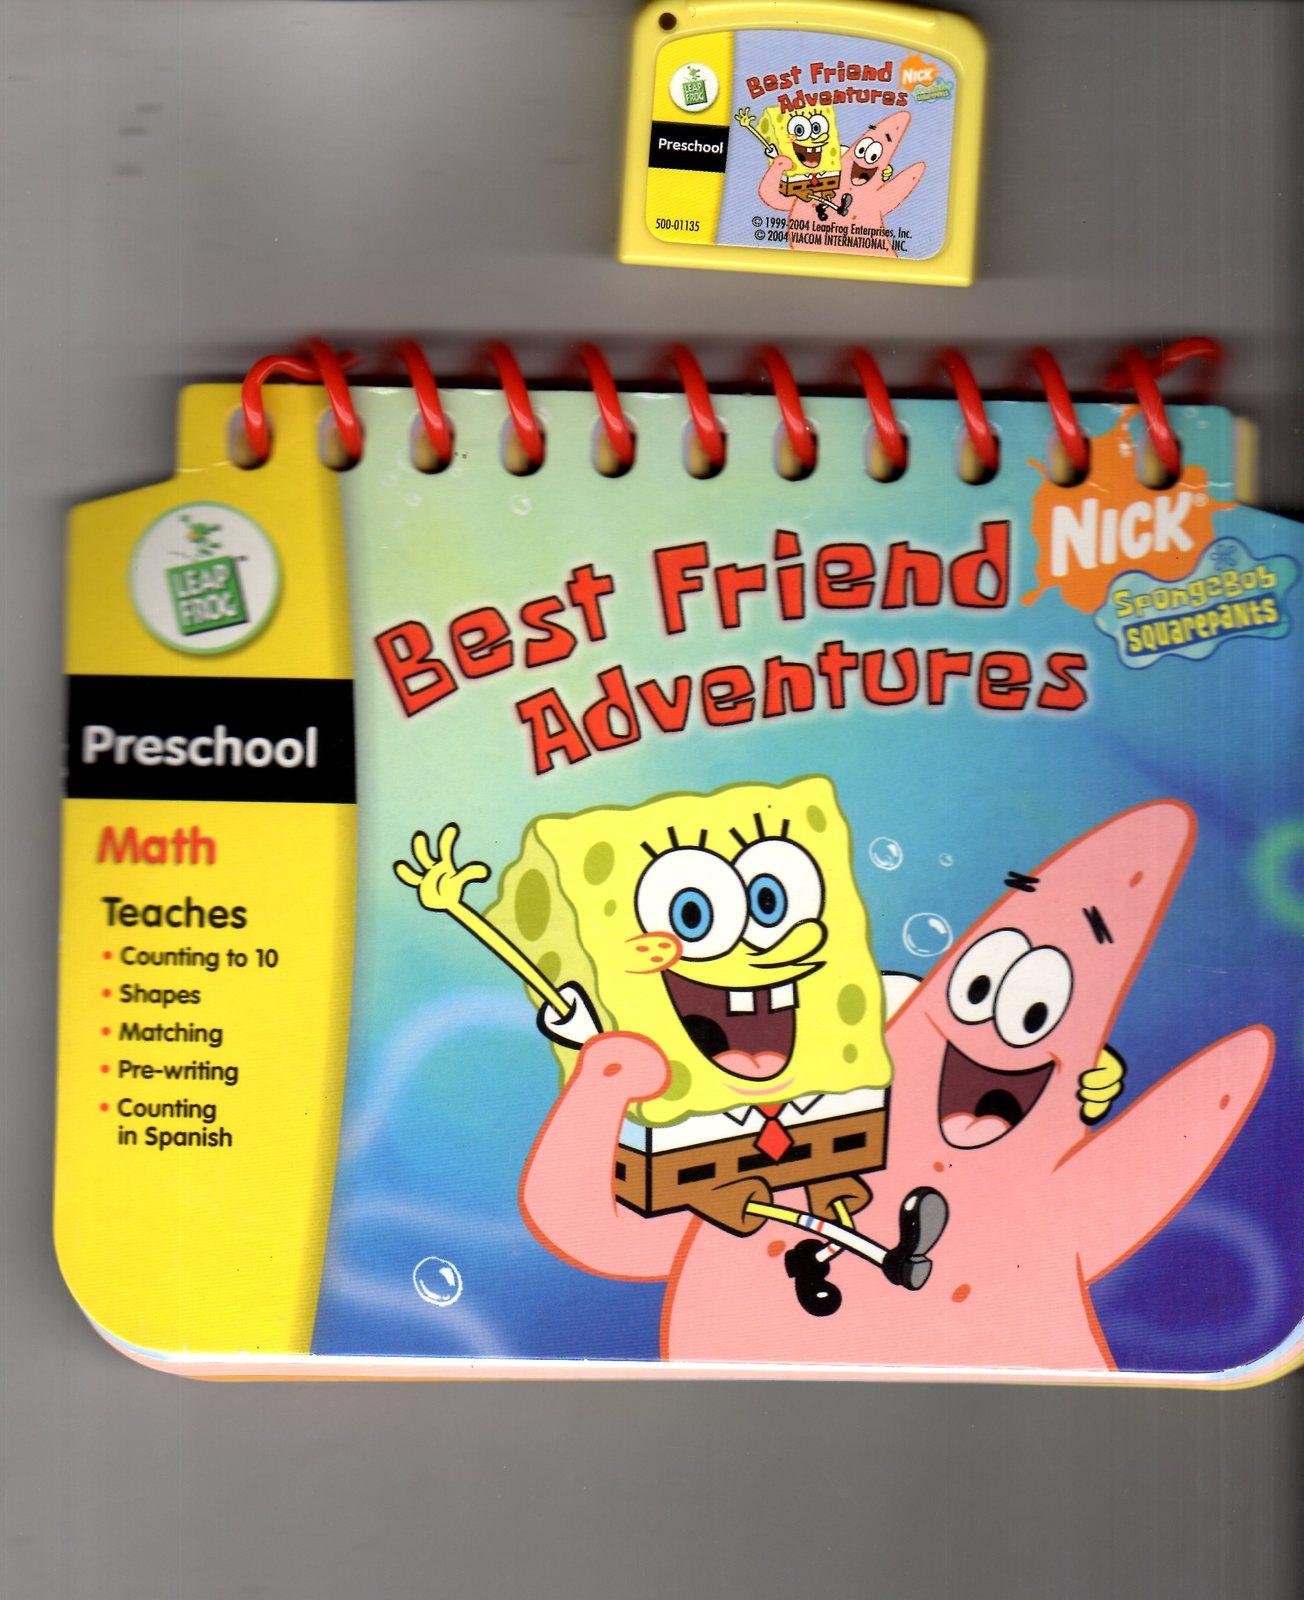 Leap Frog - My First LeapPad - Spongebob Squarepants Best Friend Adventure